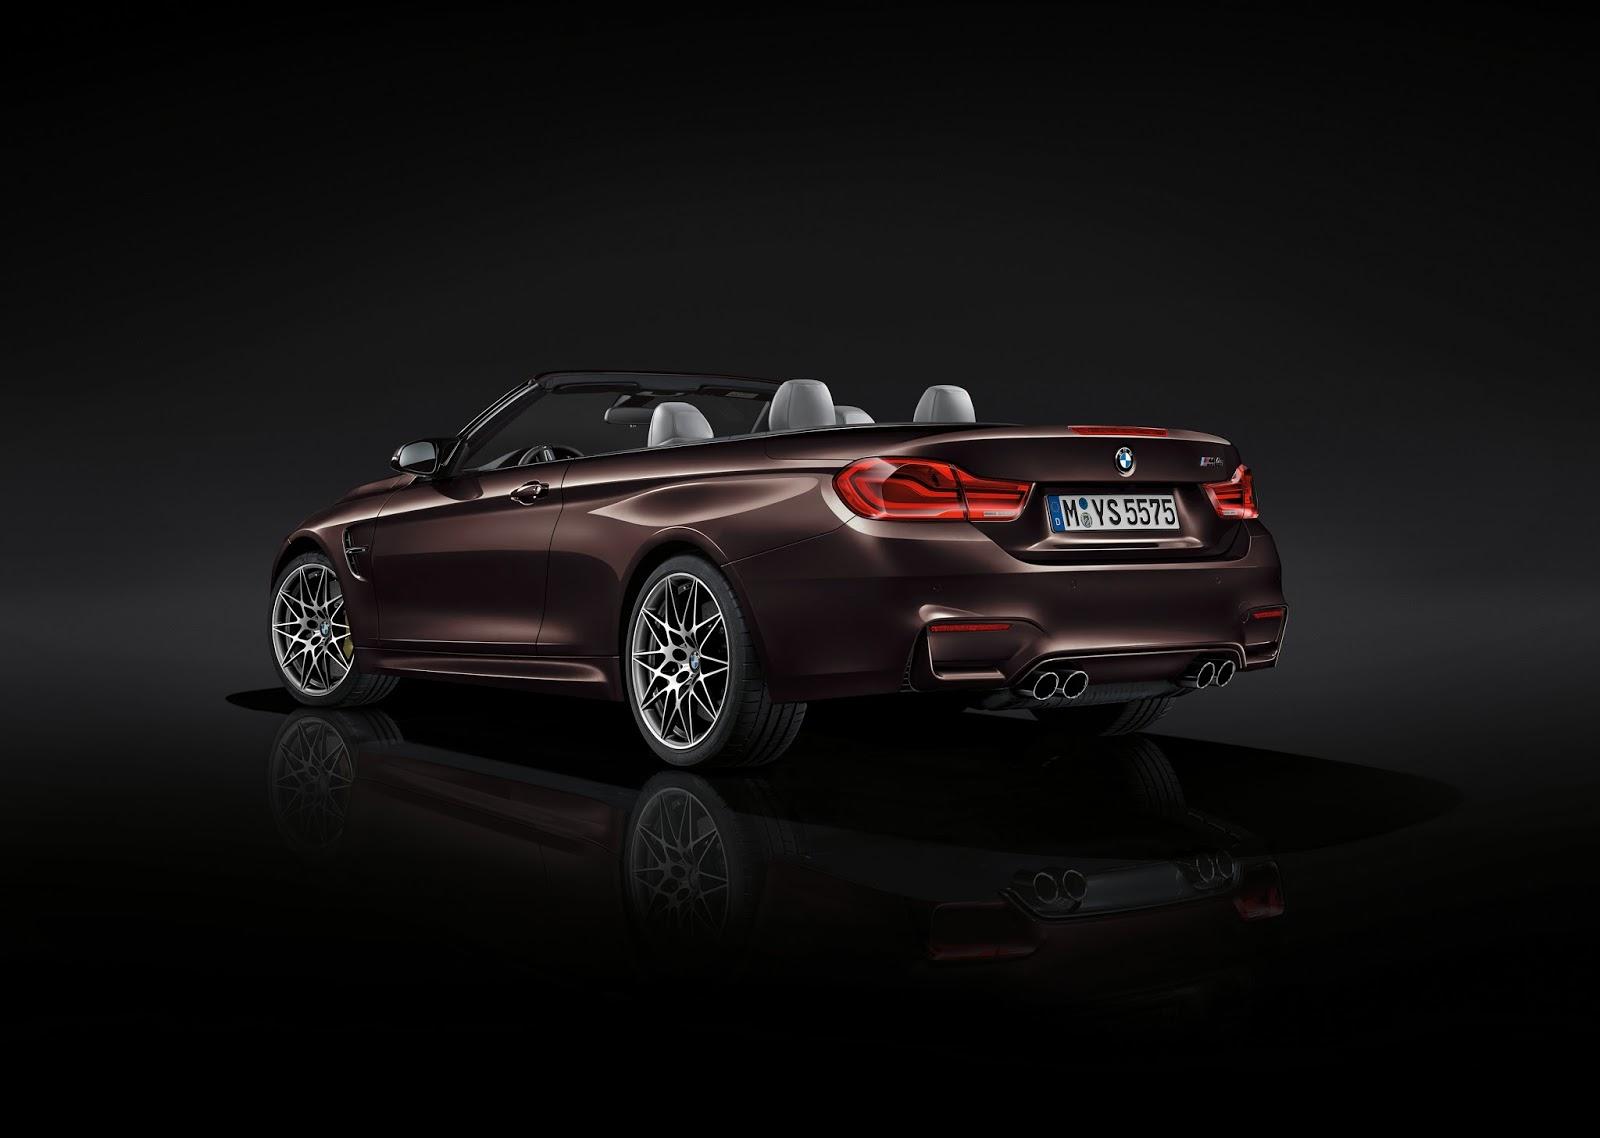 P90244967 highRes bmw m4 convertible 0 Η νέα BMW Σειρά 4, με πιο σφιχτή ρύθμιση ανάρτησης BMW, Bmw 4, BMW 4 Cabrio, BMW 4 Coupe, BMW 4 Gran Coupé, Facelift